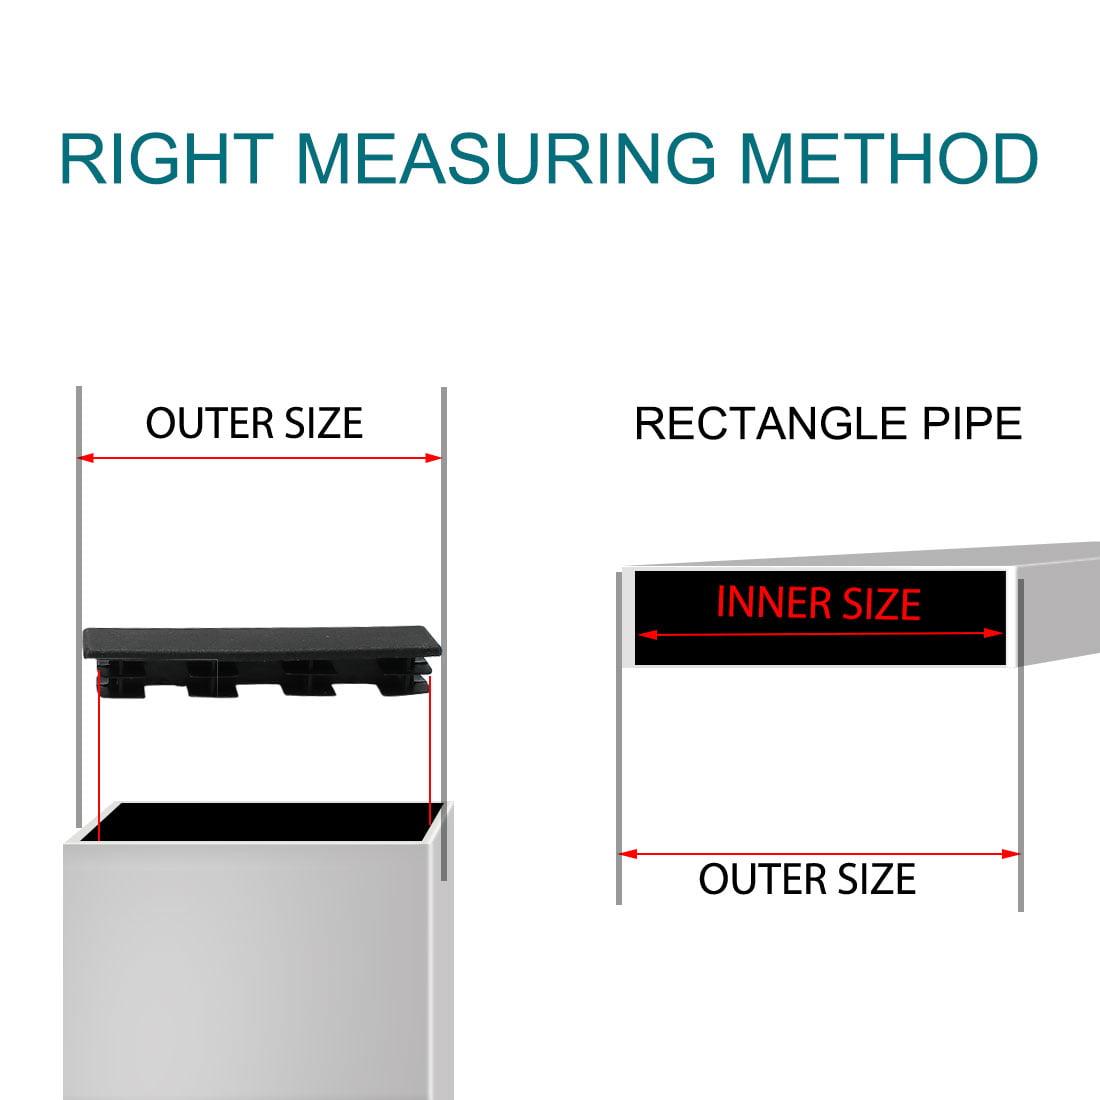 20 x 100mm Plastic Rectangle Ribbed Tube Inserts Furniture Floor Protector 60pcs - image 6 de 7